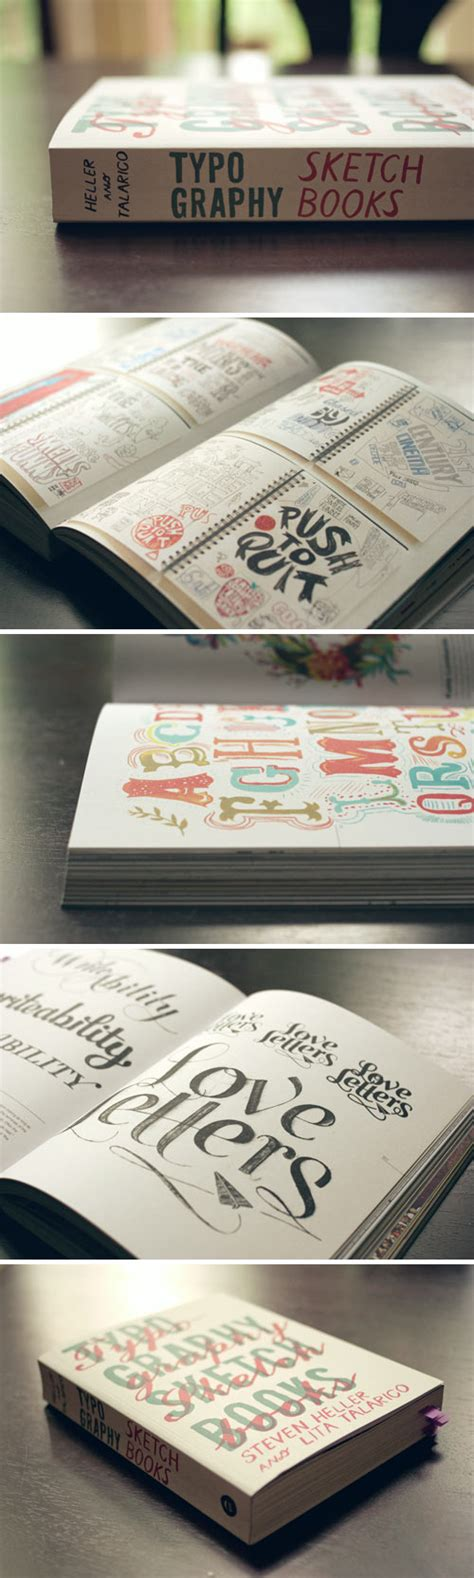 typography sketchbooks typography sketchbooks wit whistle